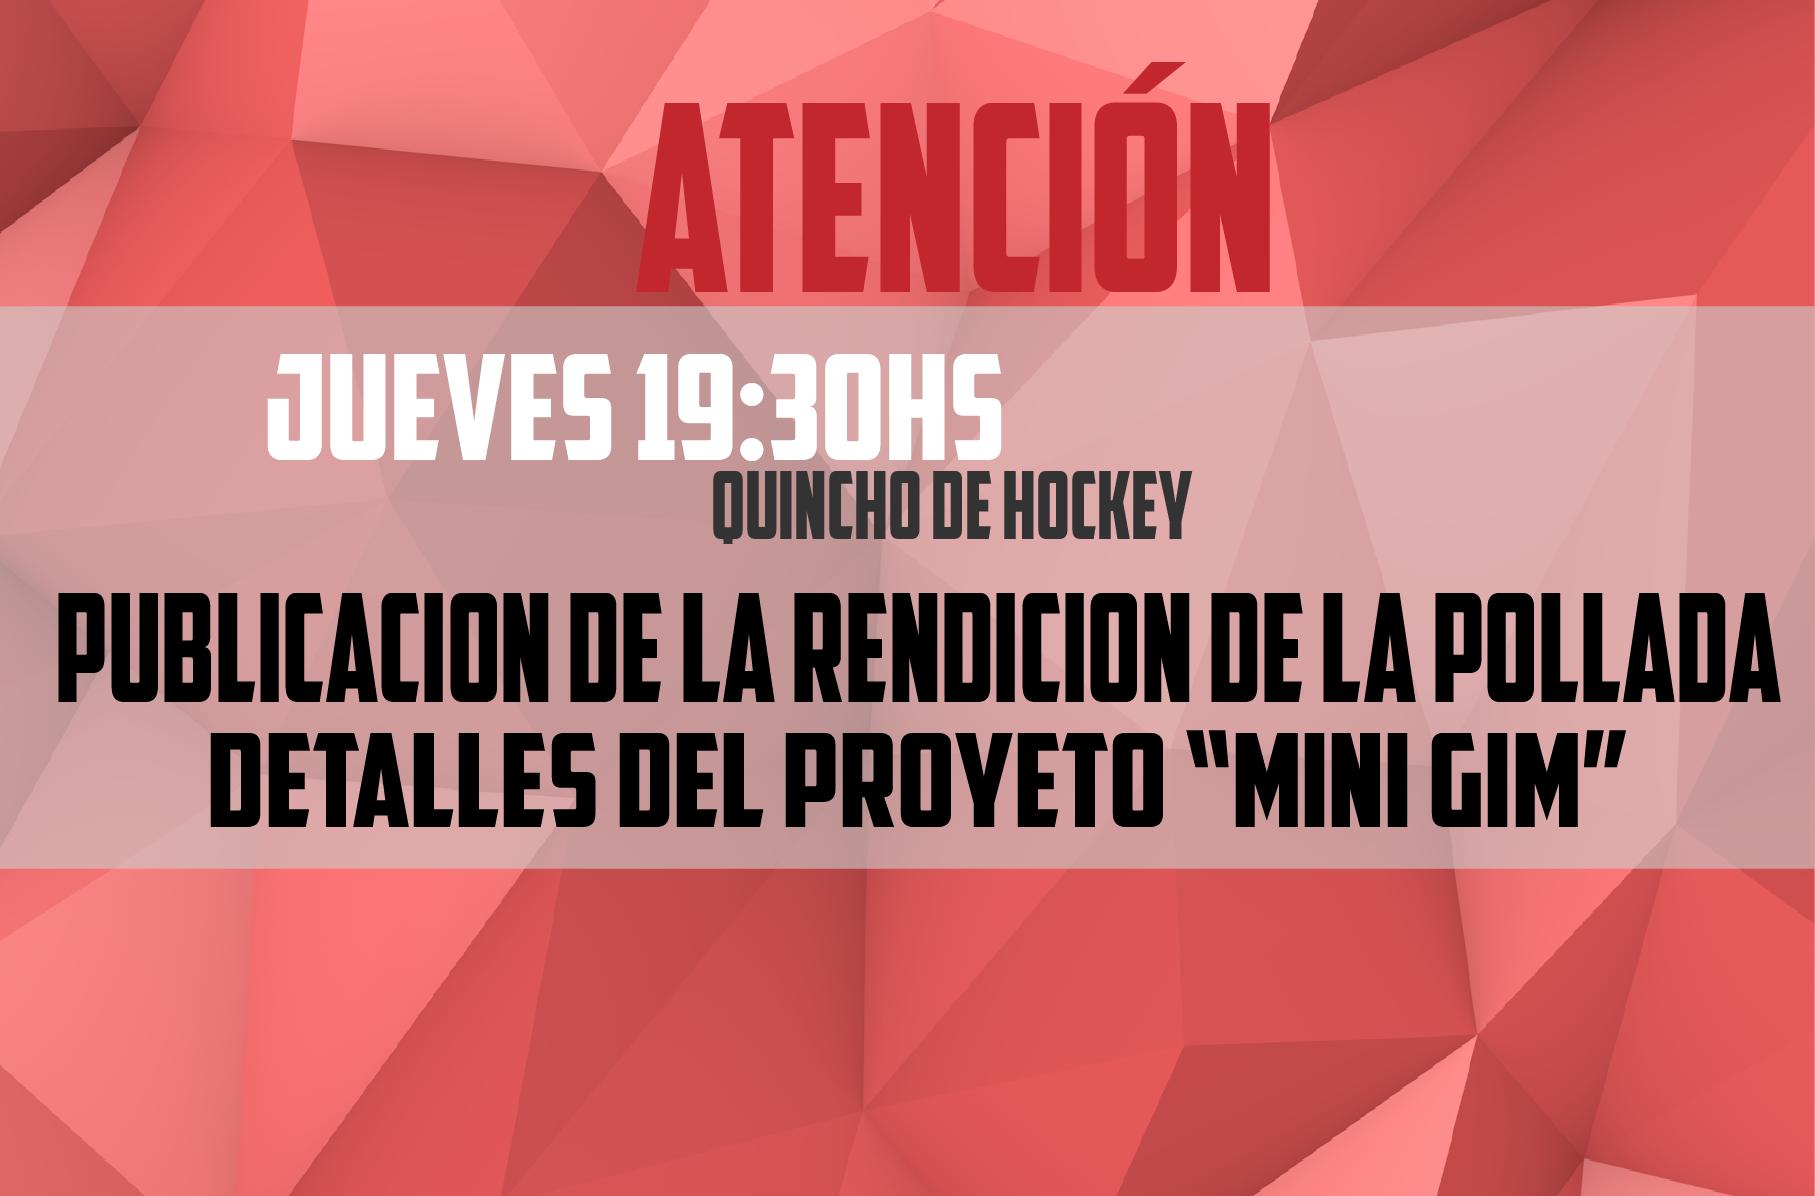 Hockey - Minigimnasio - atencion